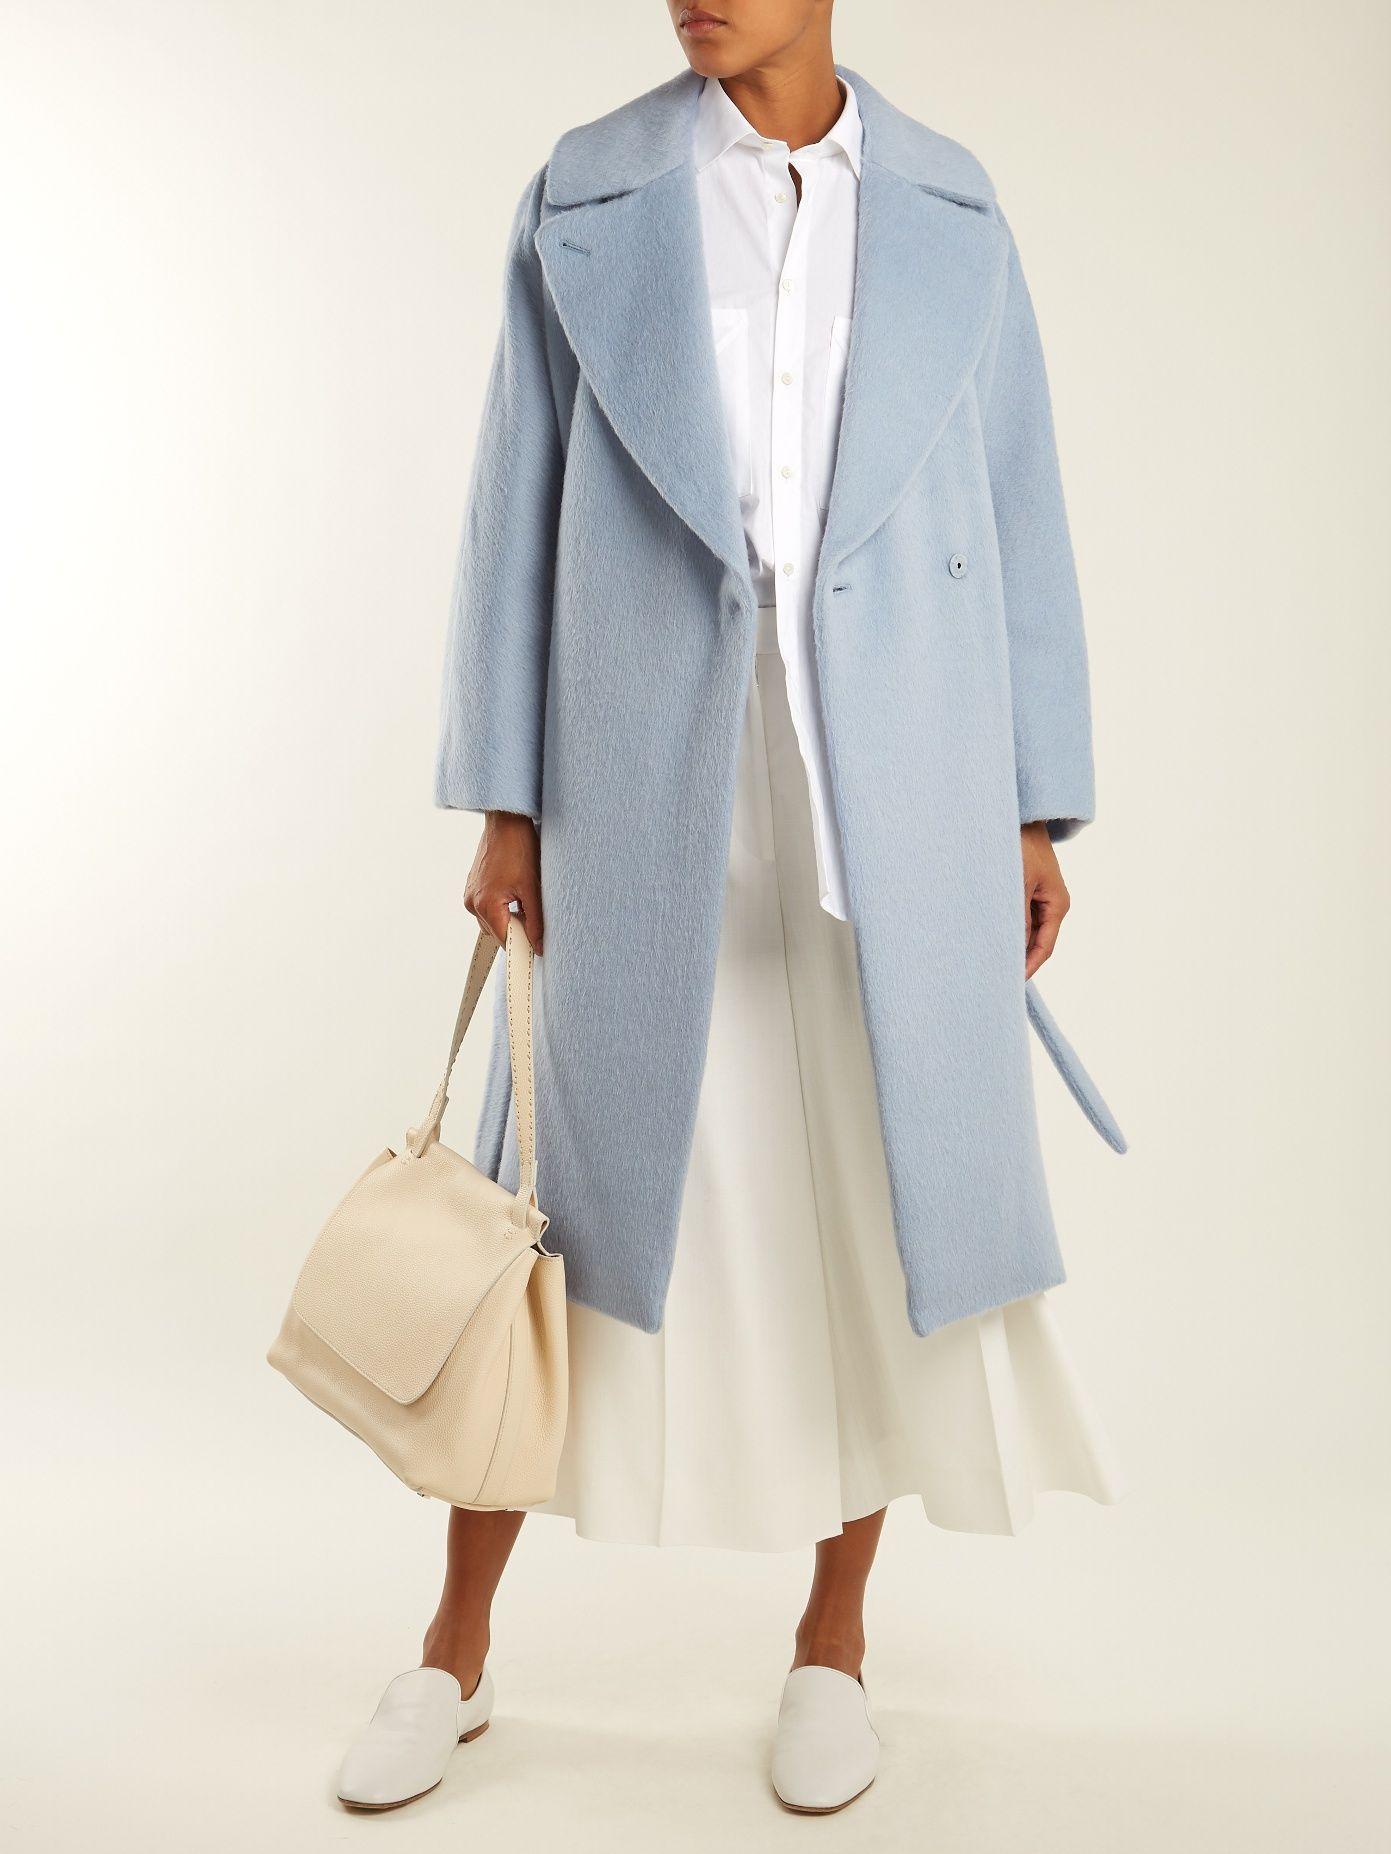 Click Here To Buy Weekend Max Mara Saletta Coat At Matchesfashion Com Odezhda Palto Zhenskaya Moda